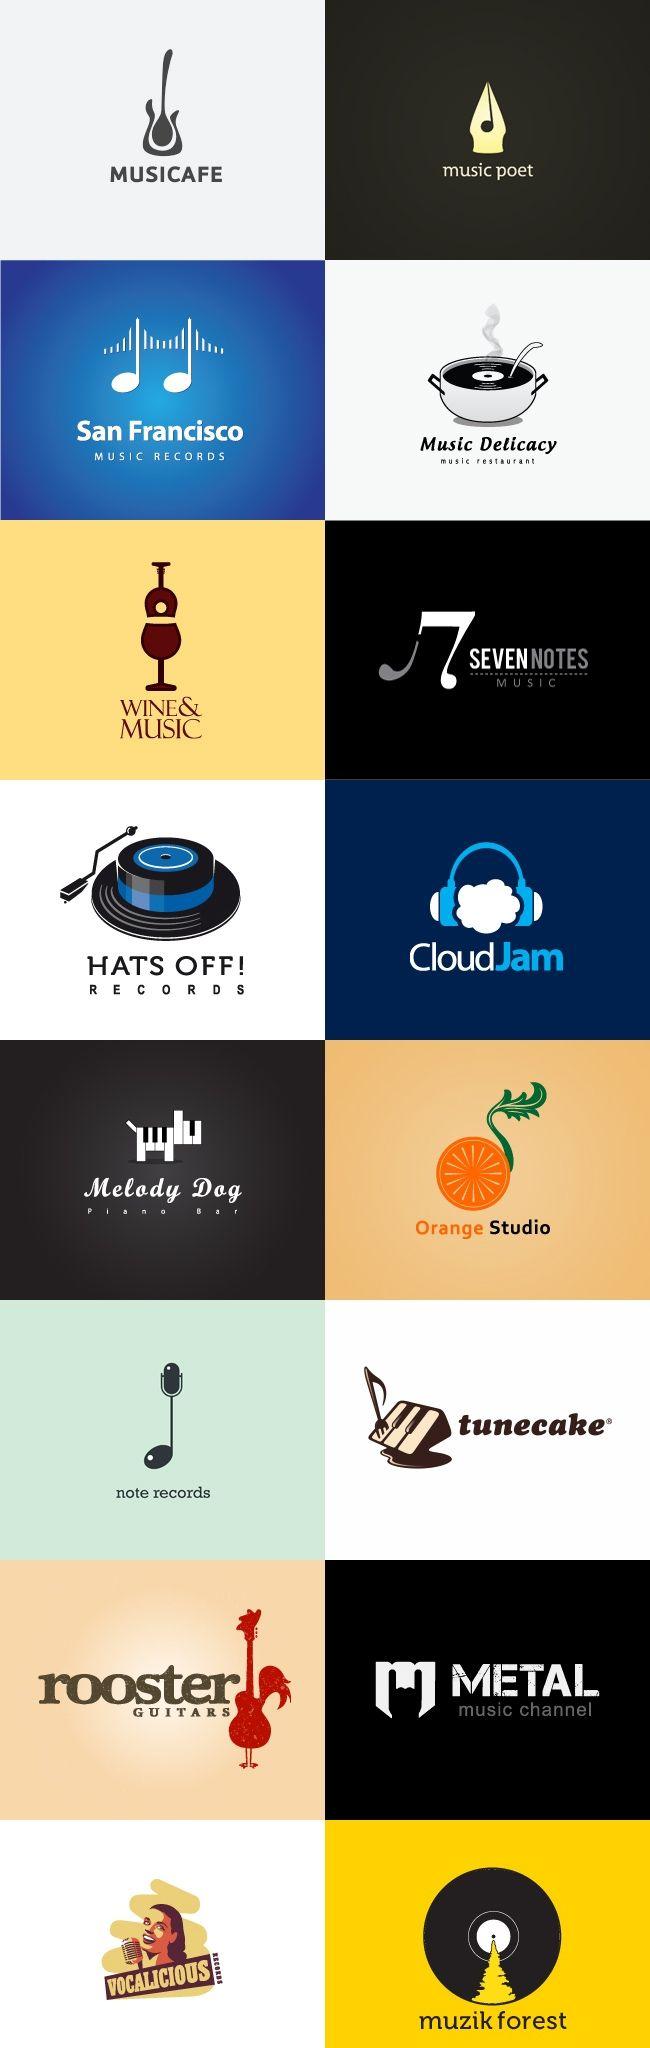 http://www.grafiker.de/pages/images/news/music-logo-inspiration02.jpg